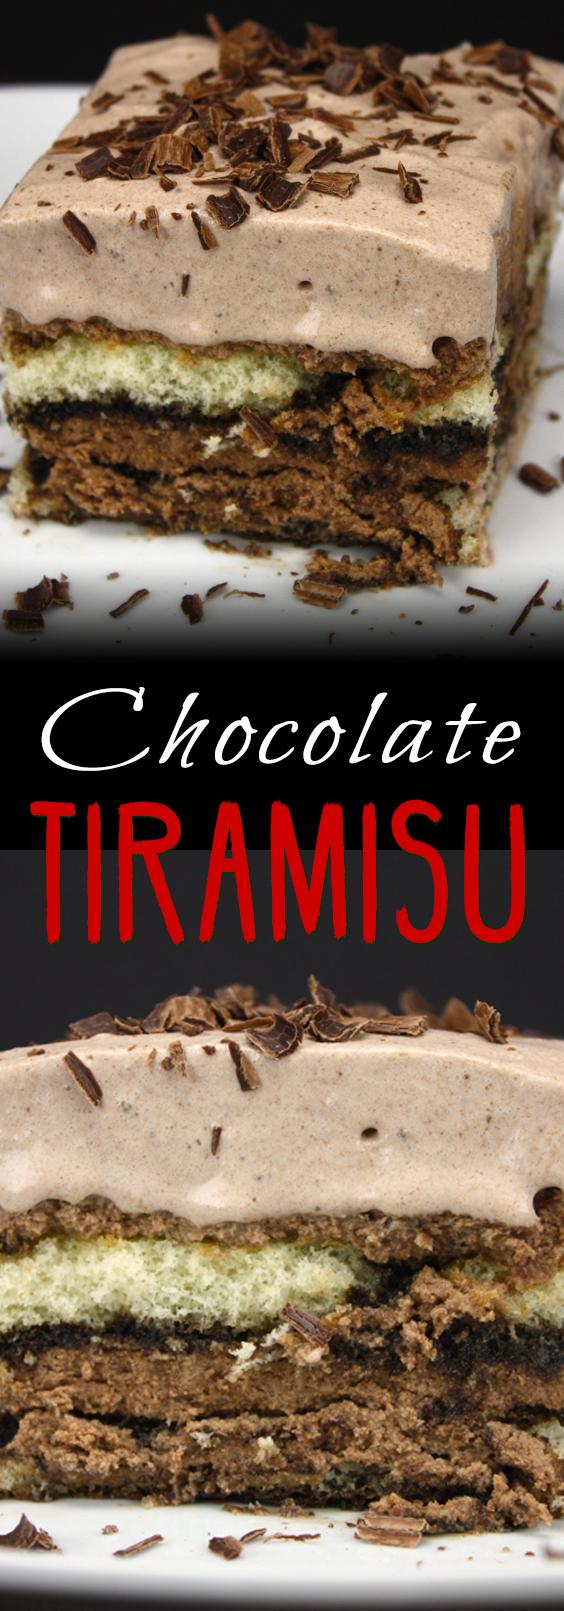 Chocolate Tiramisu - A delicious twist on a classic elegant dessert!